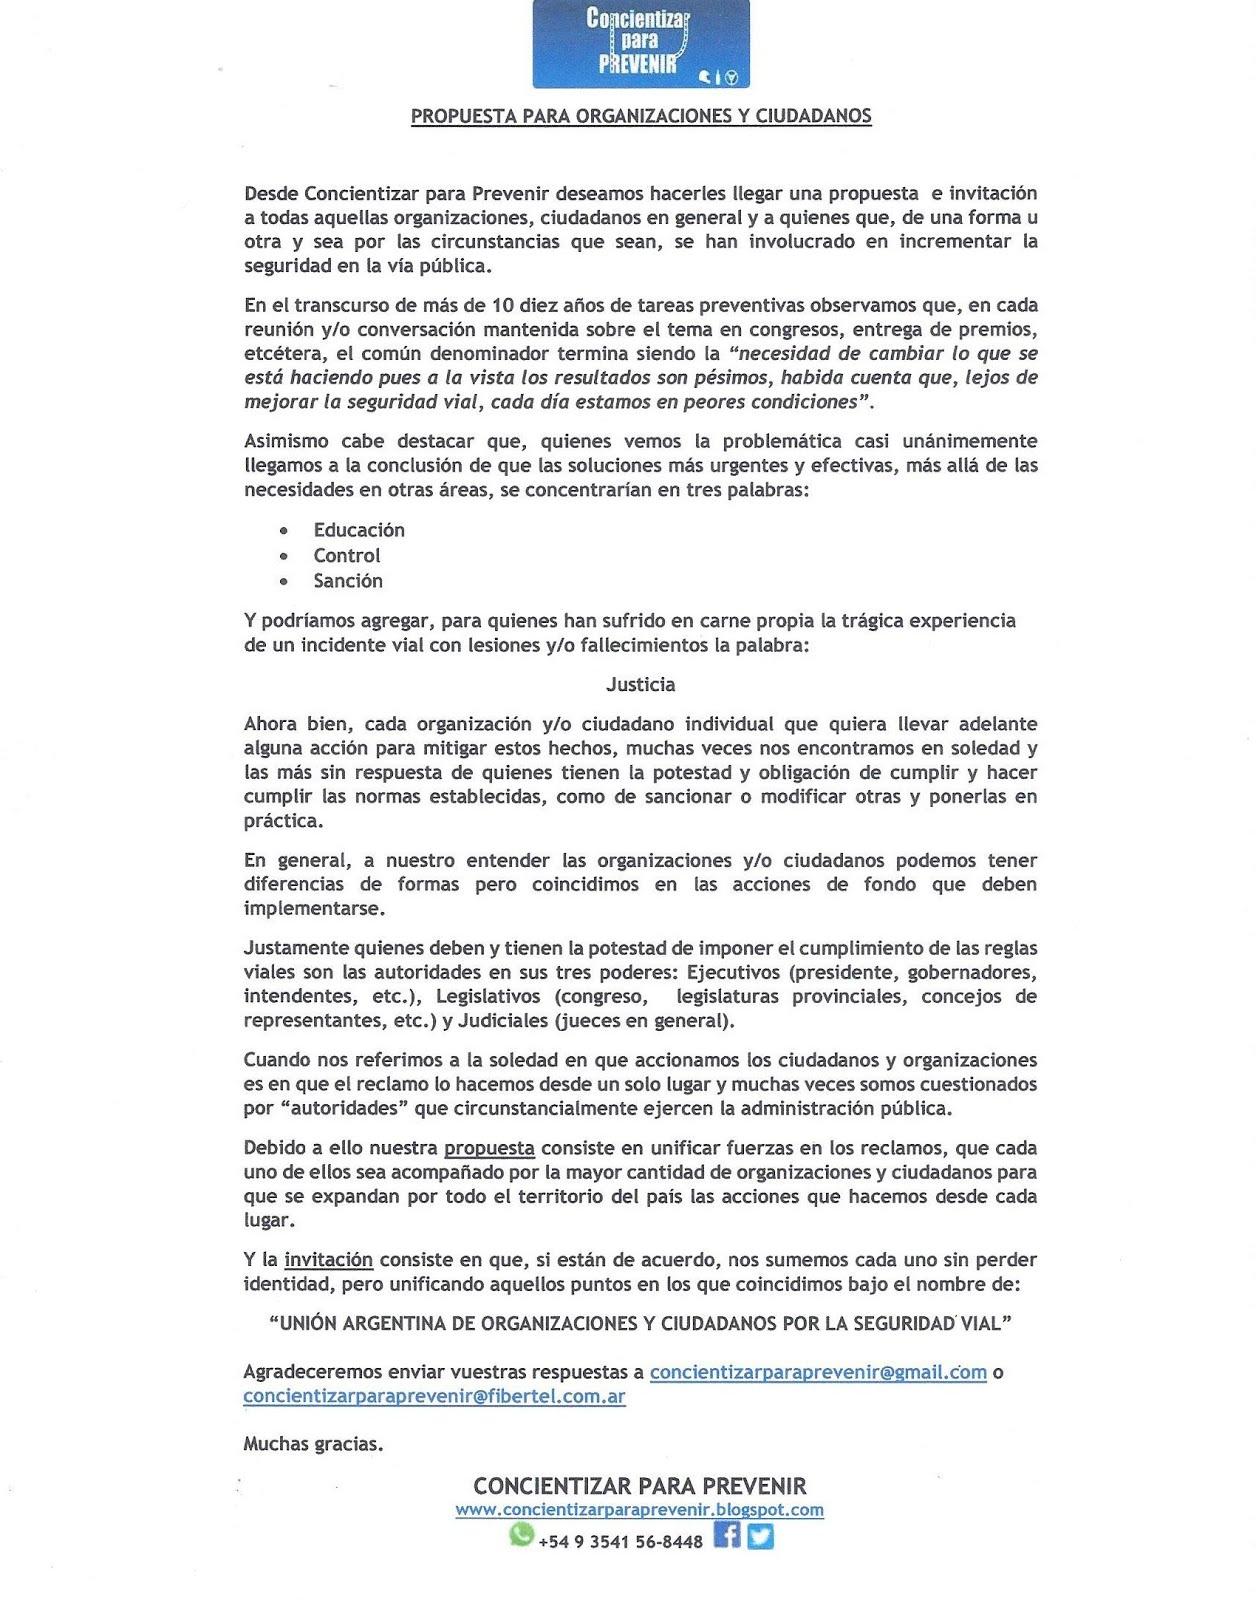 PROPUESTA E INVITACIÓN 12.04.2019